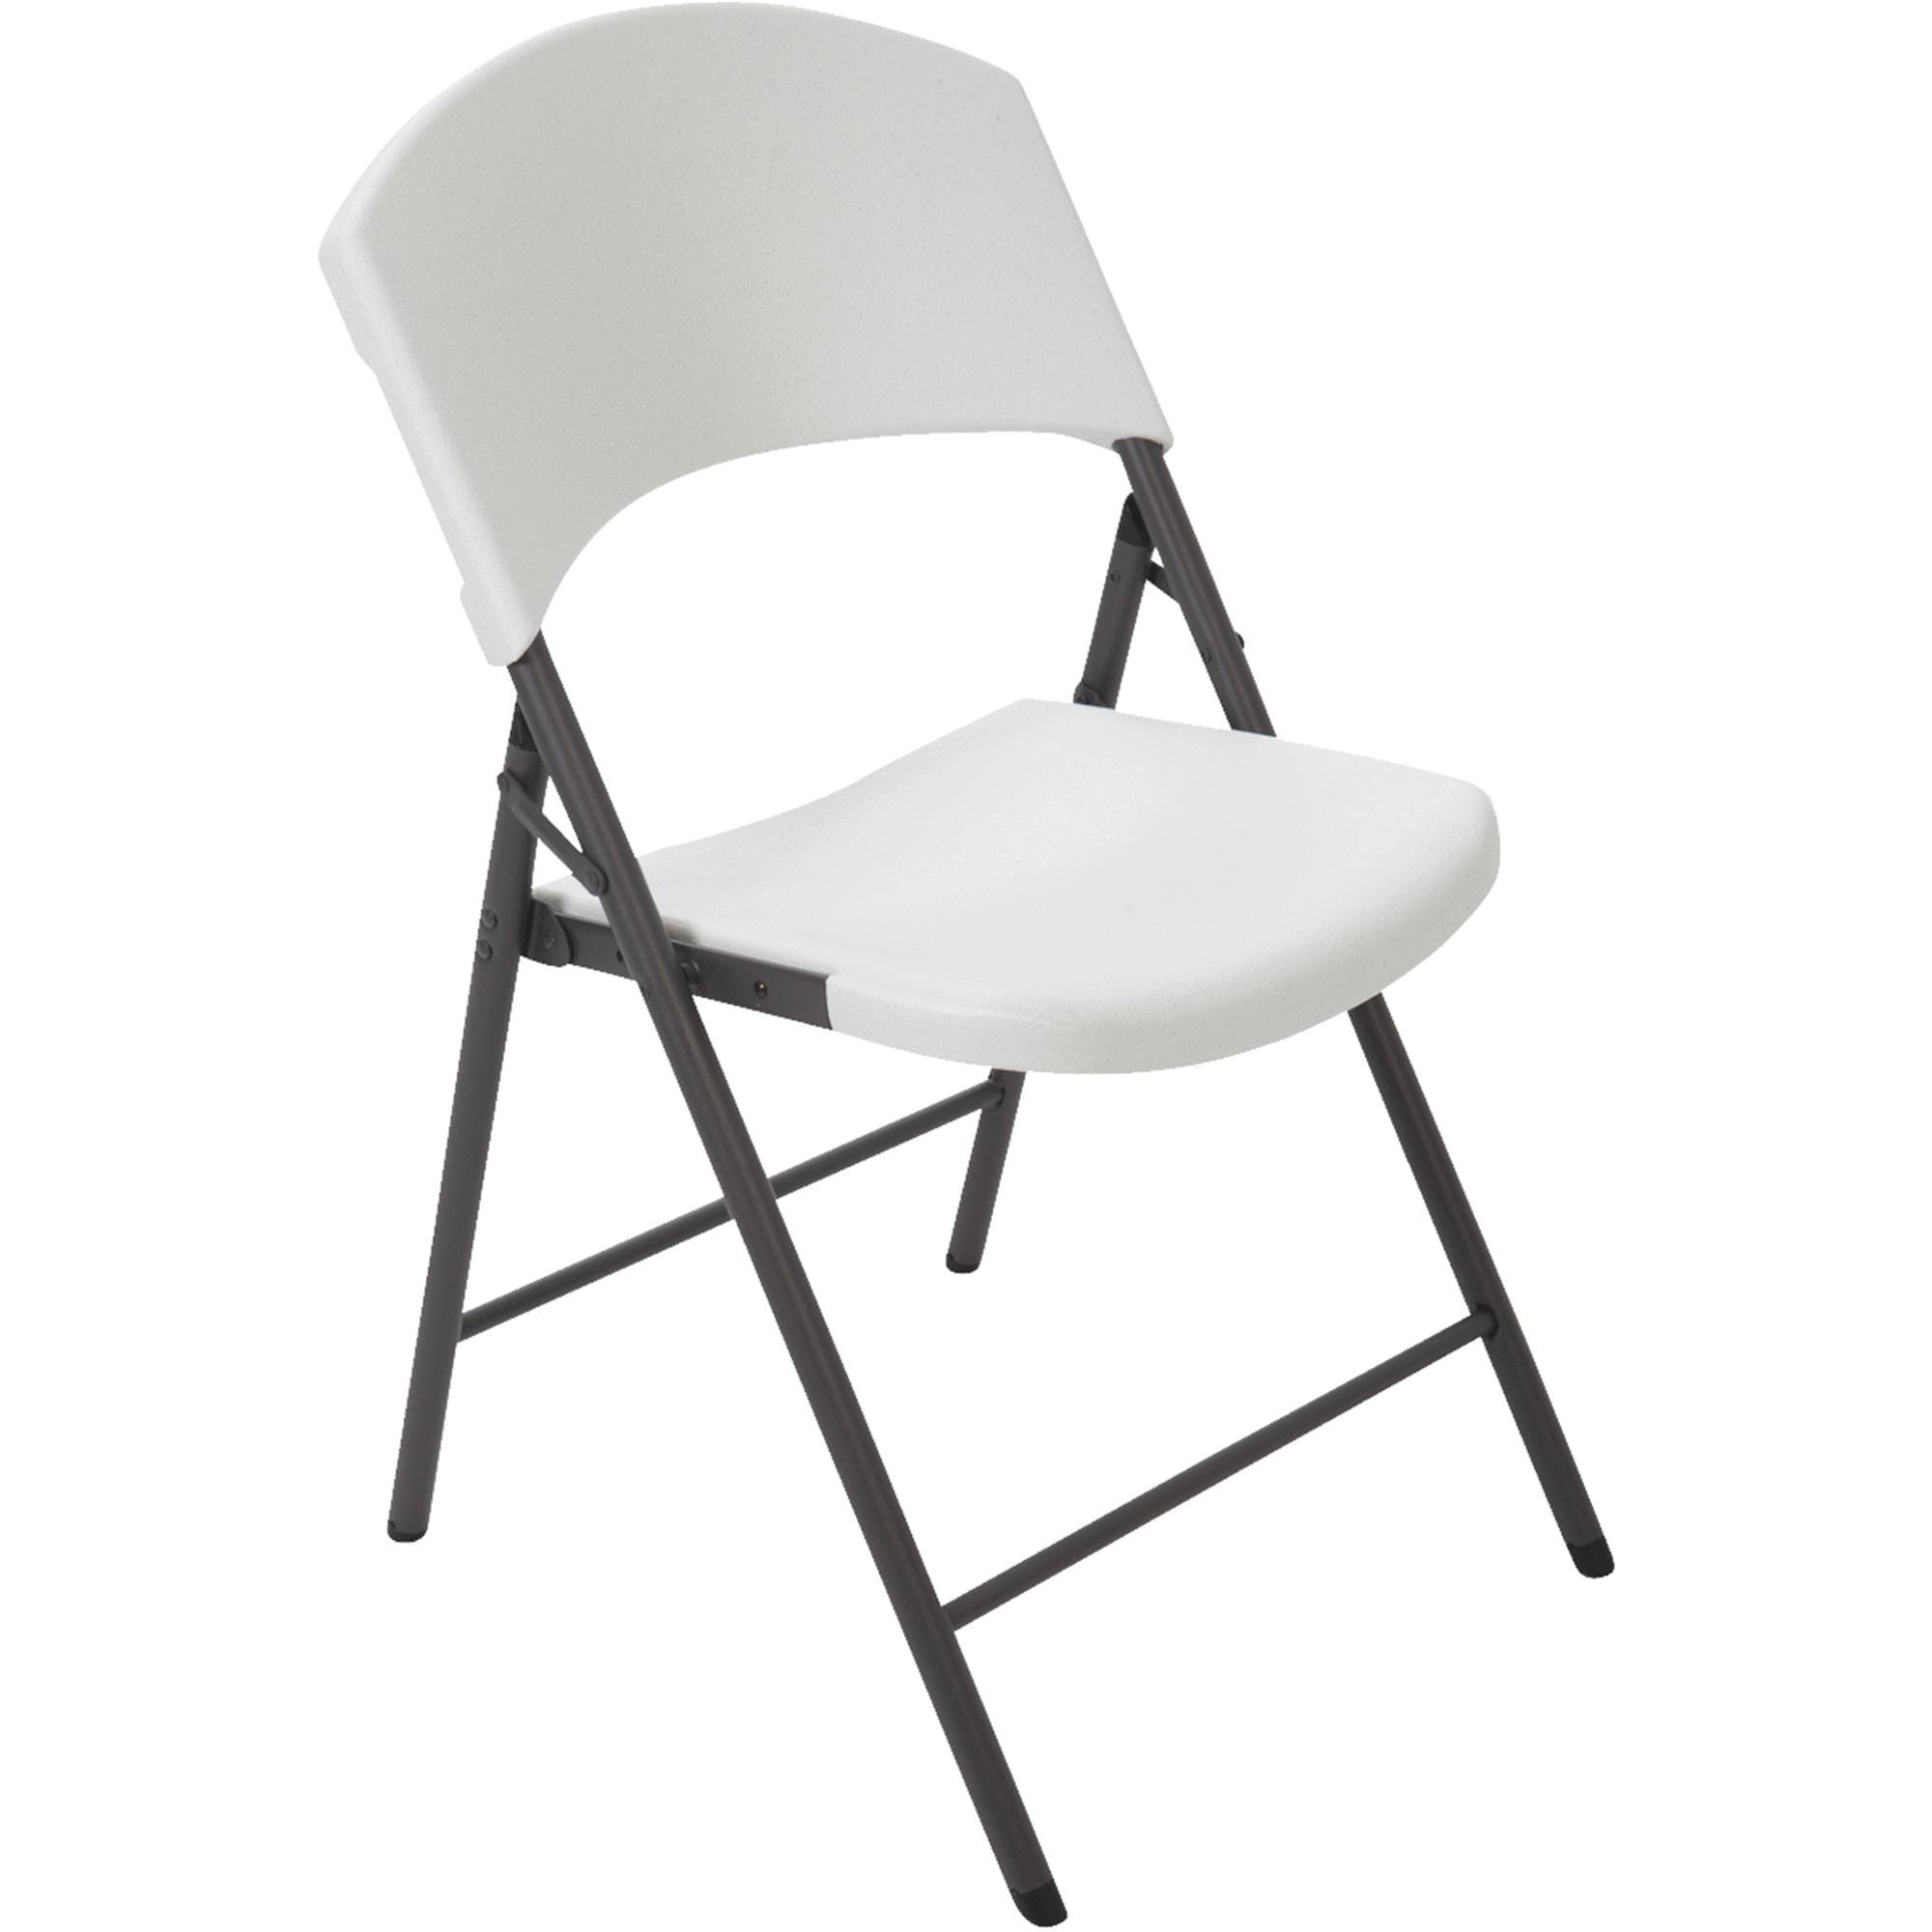 Lifetime Light Commercial Folding Chair